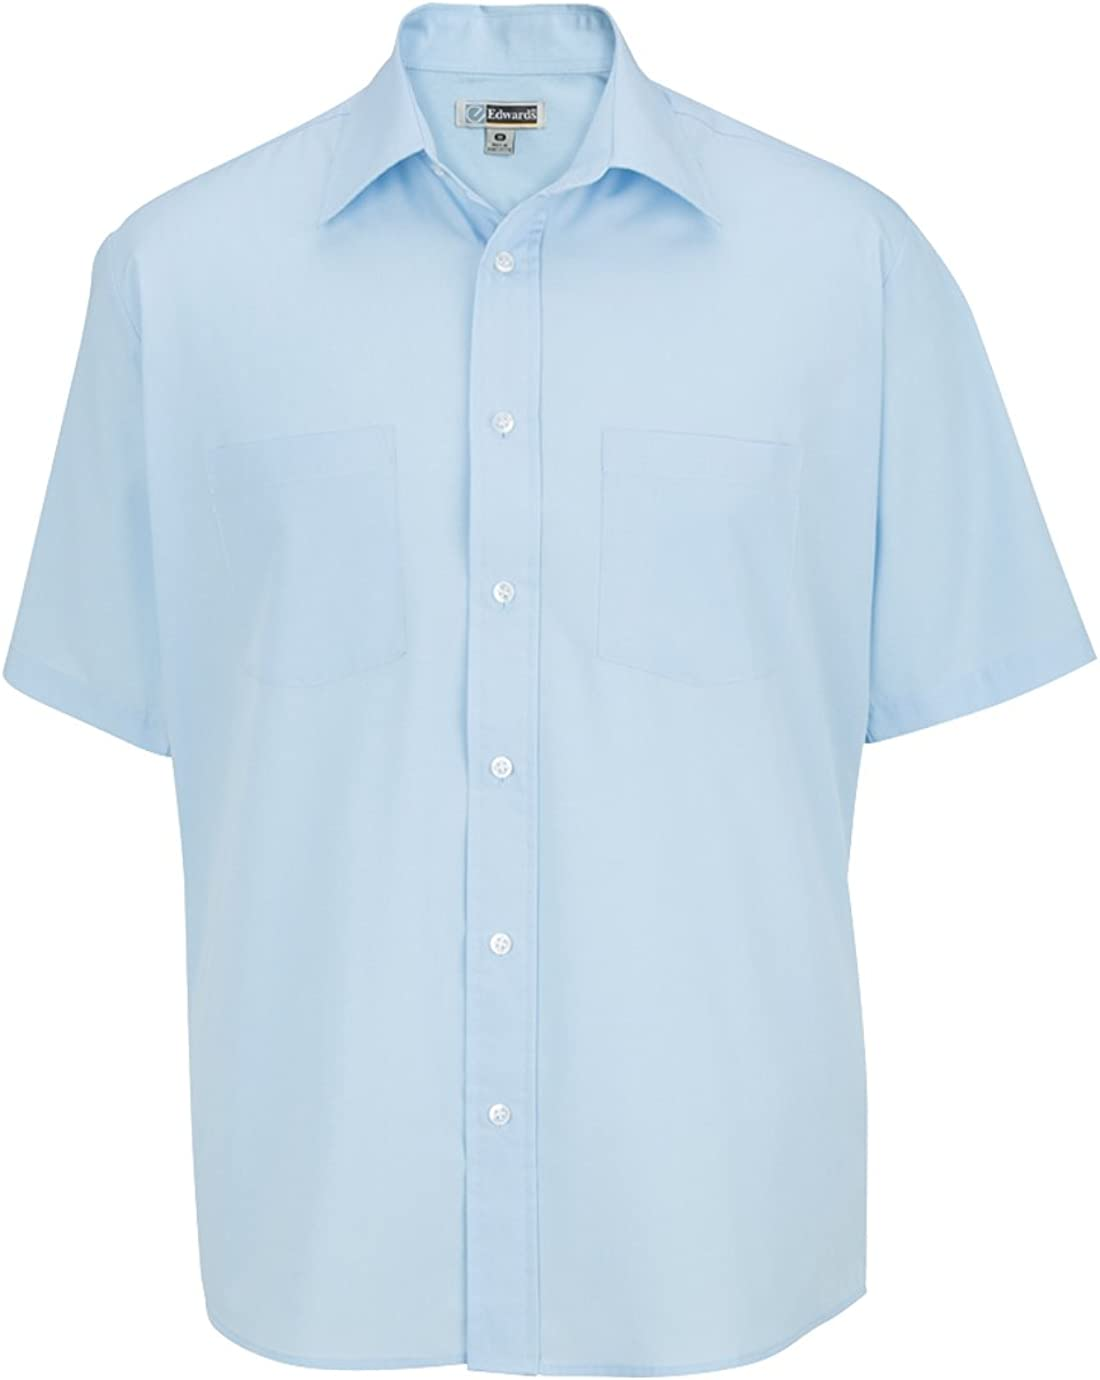 Edwards Garment Men's Business Performance Broadcloth Short Sleeve Work Shirt